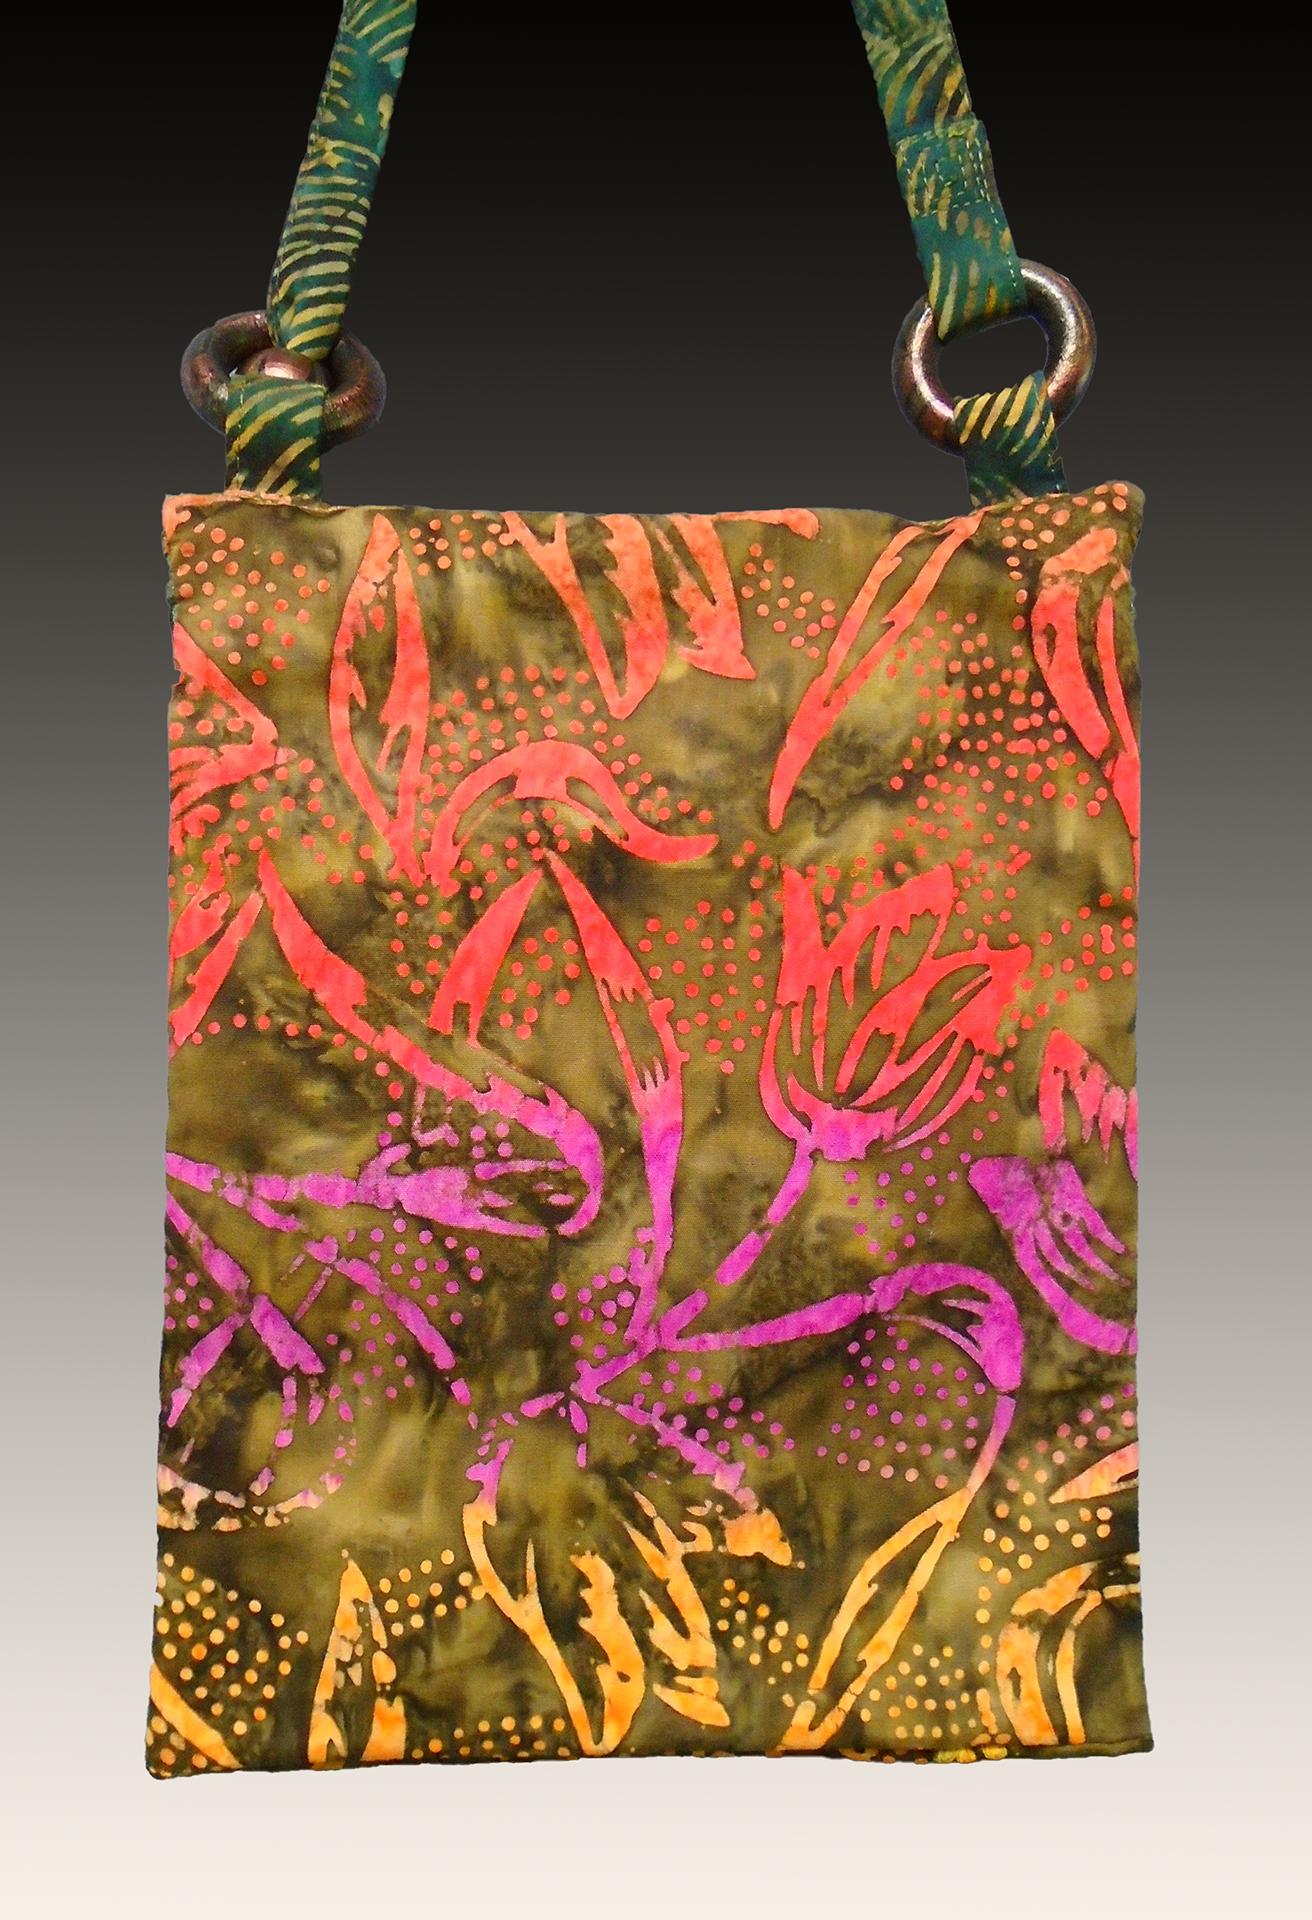 Reverse view of zippered bag showing Indonesian tulip batik